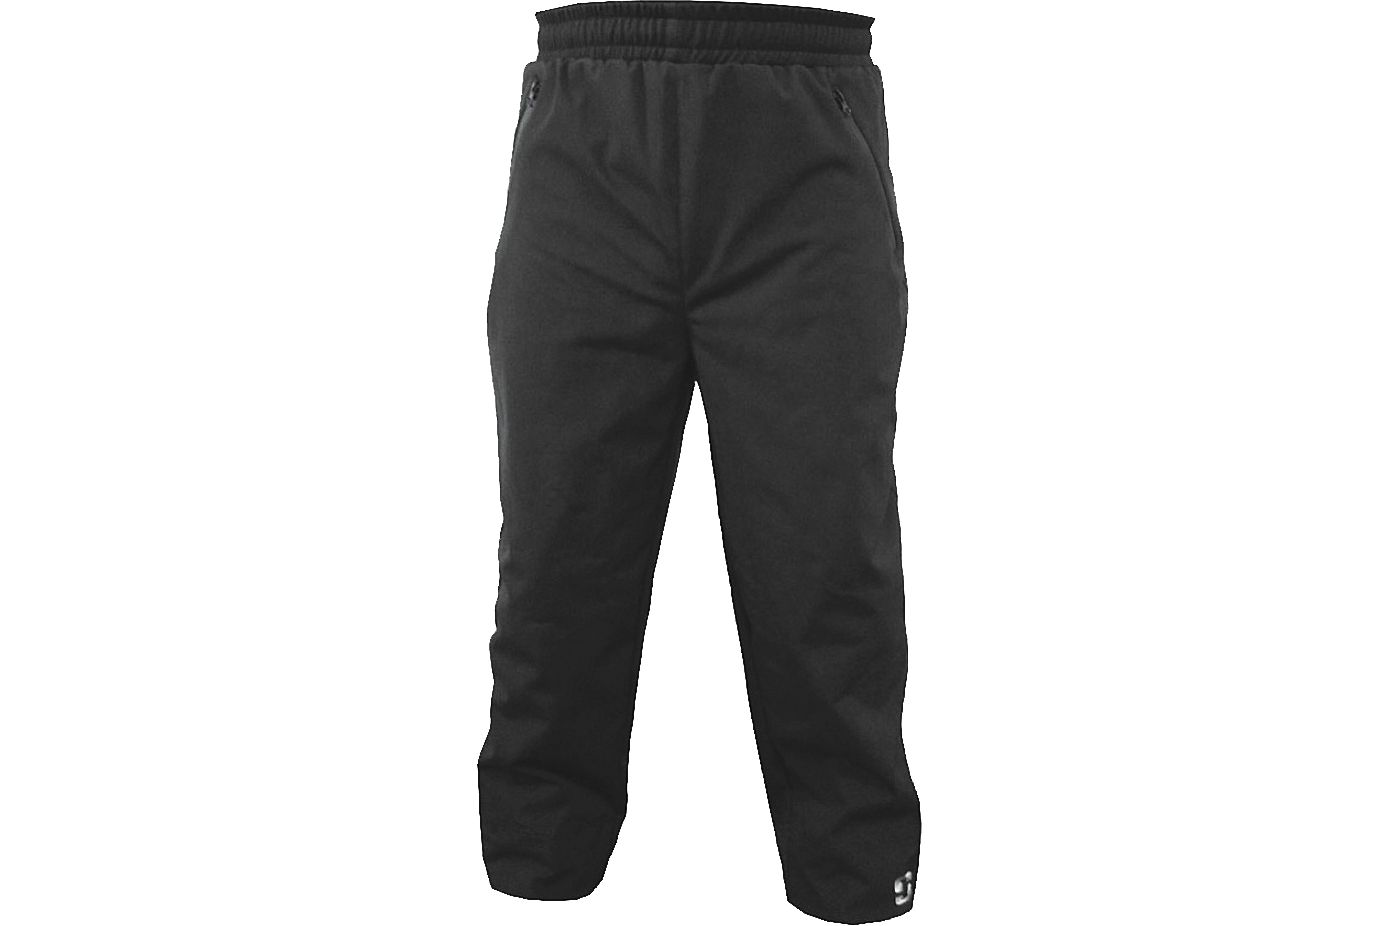 Striker Men's SI Performance Pants (Regular and Big & Tall)